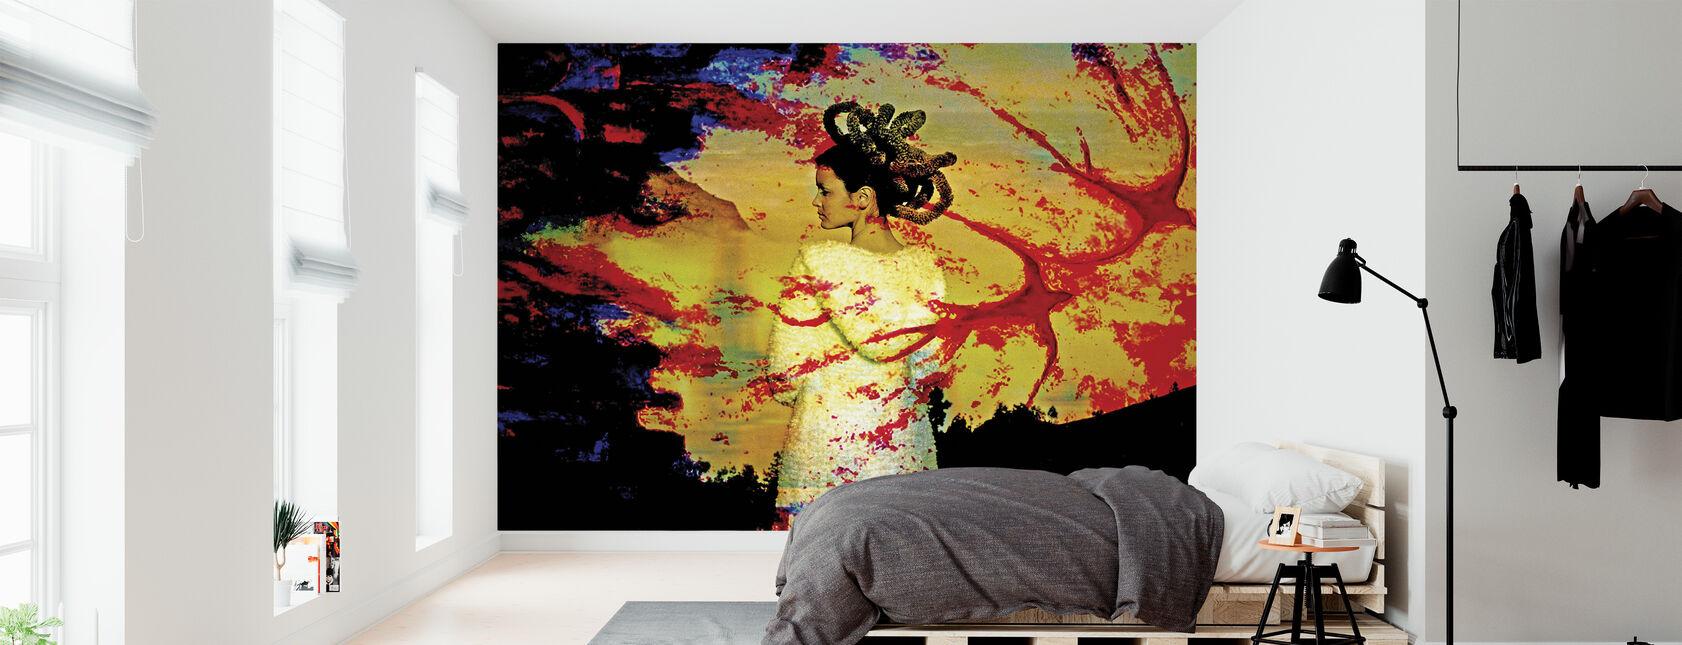 Rød fugl - Tapet - Soveværelse